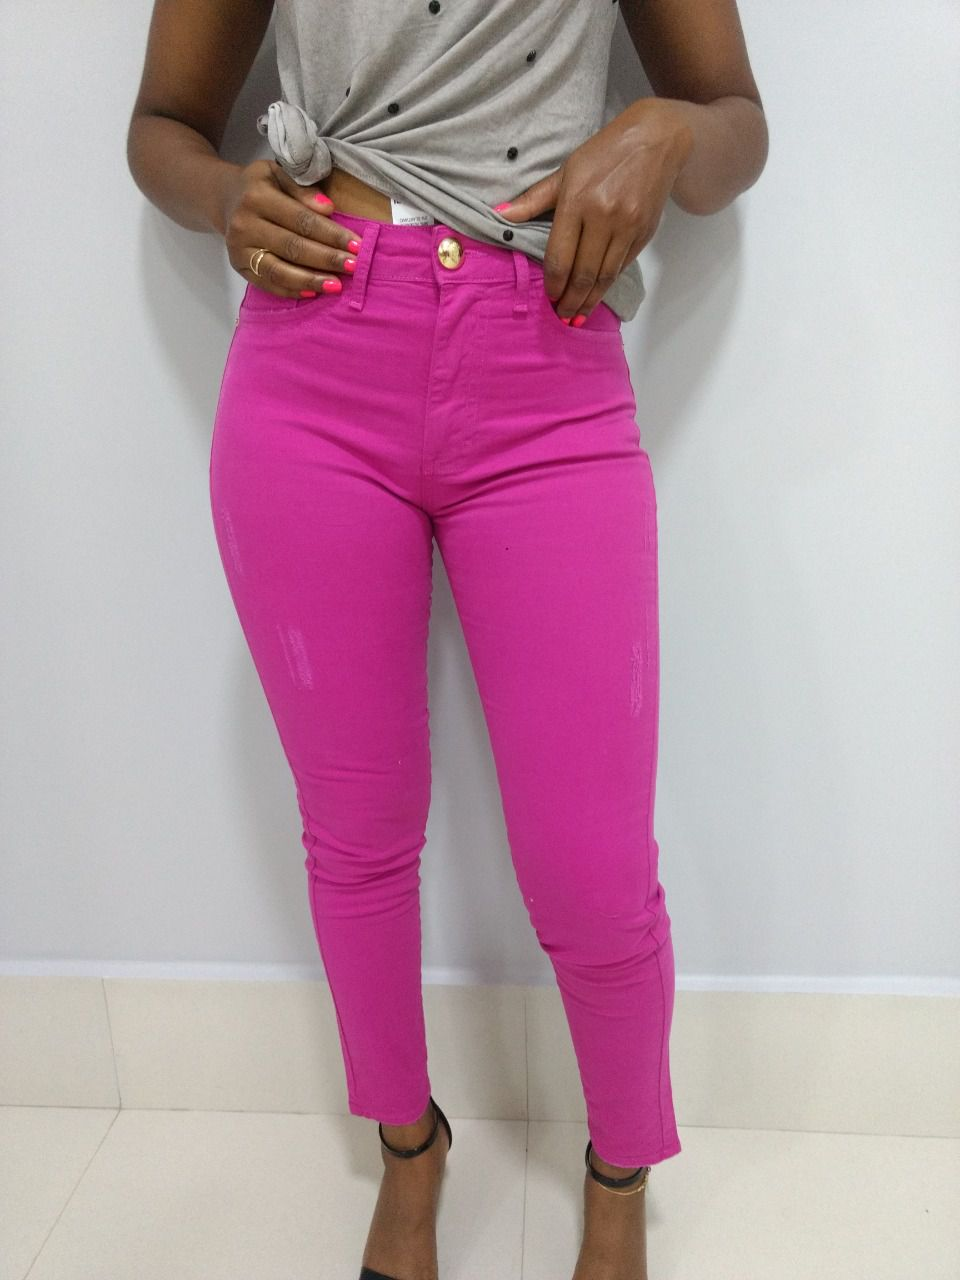 Calça Jeans Feminina Pink Sarja